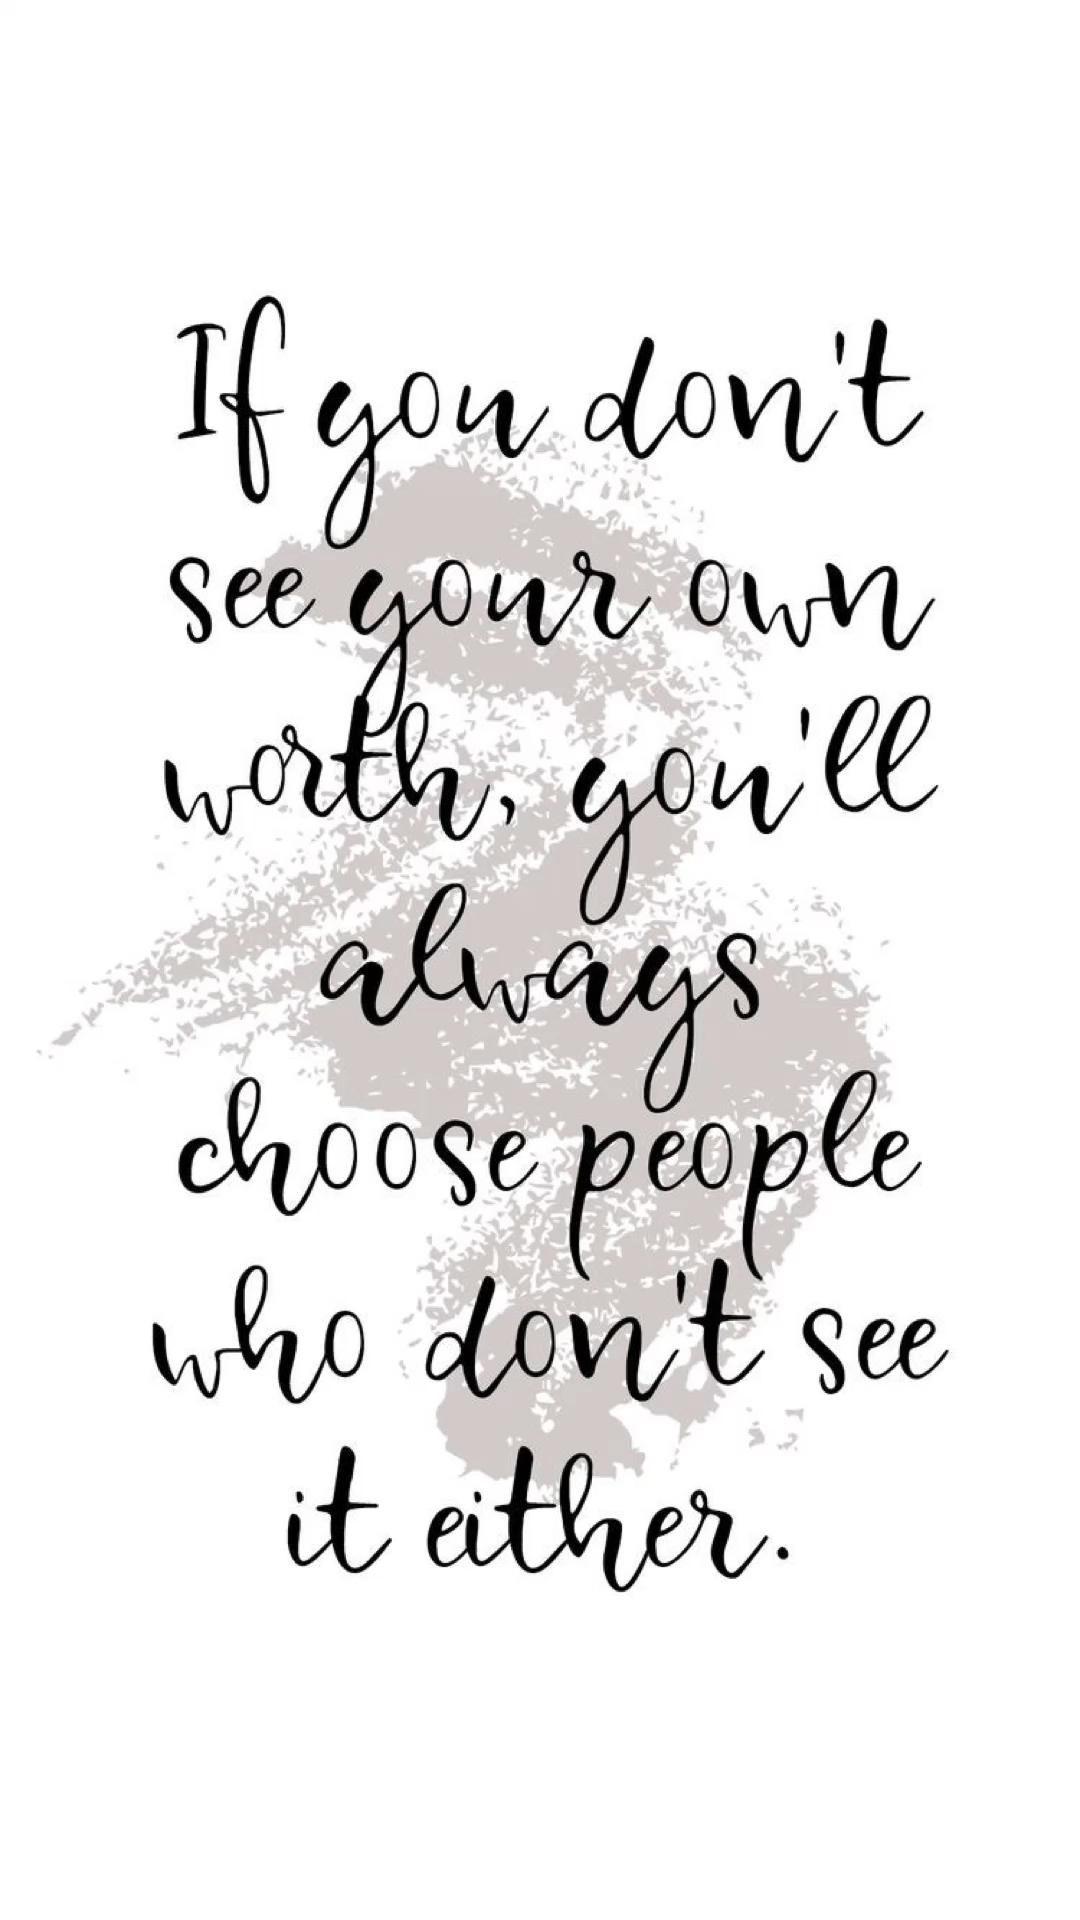 self worth, self growth, self improvement, self care, self love motivational inspirational quotes